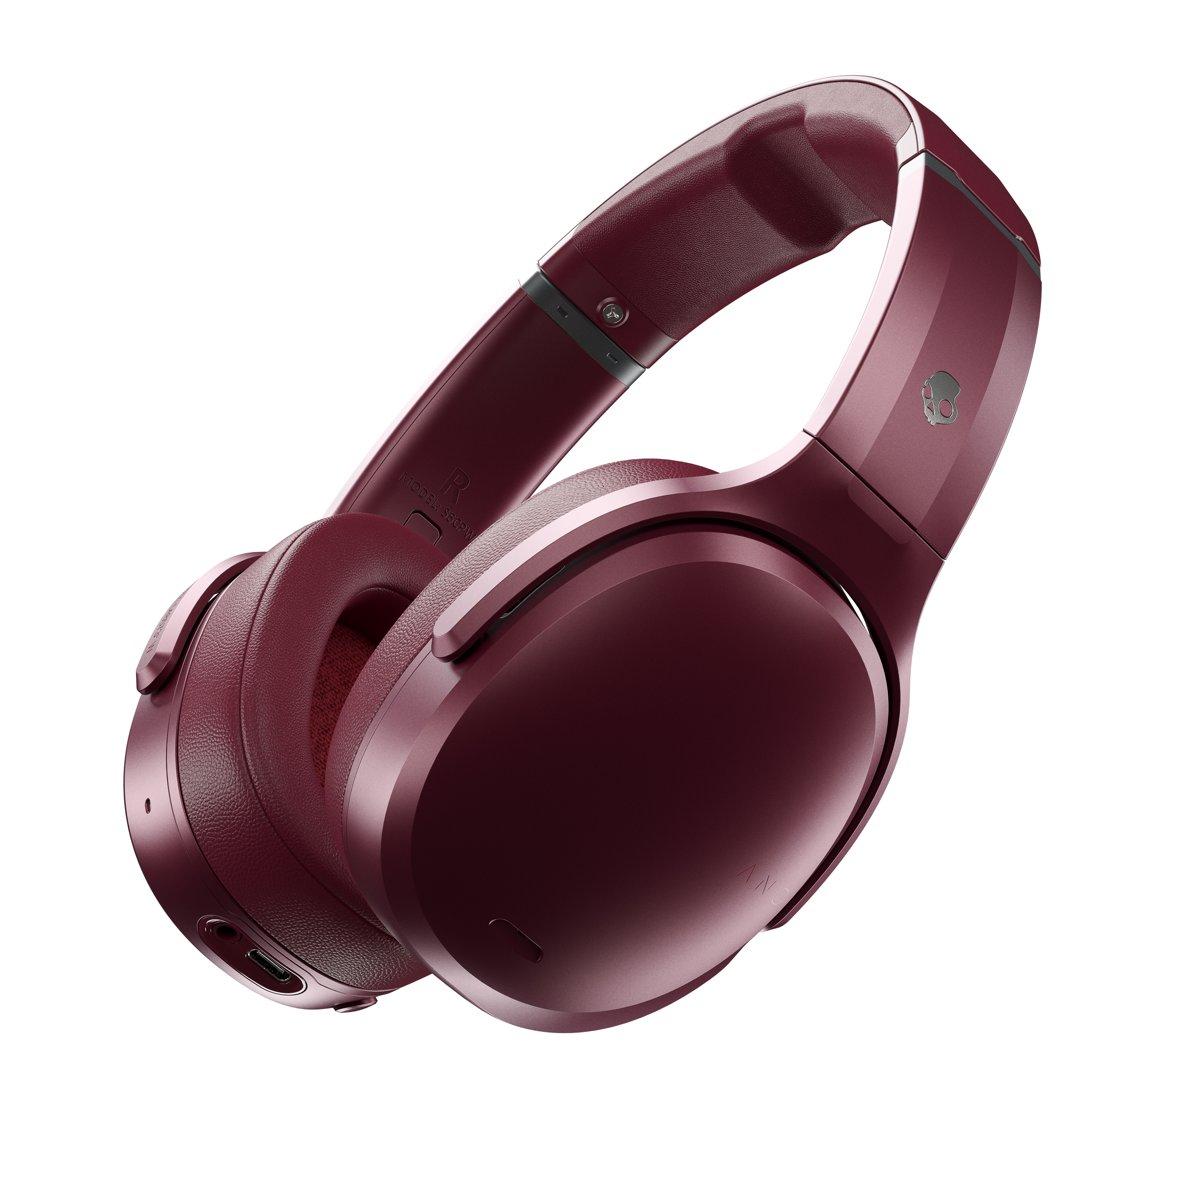 Skullcandy Crusher - Wireless Over-Ear met Noise Cancelling - Rood kopen